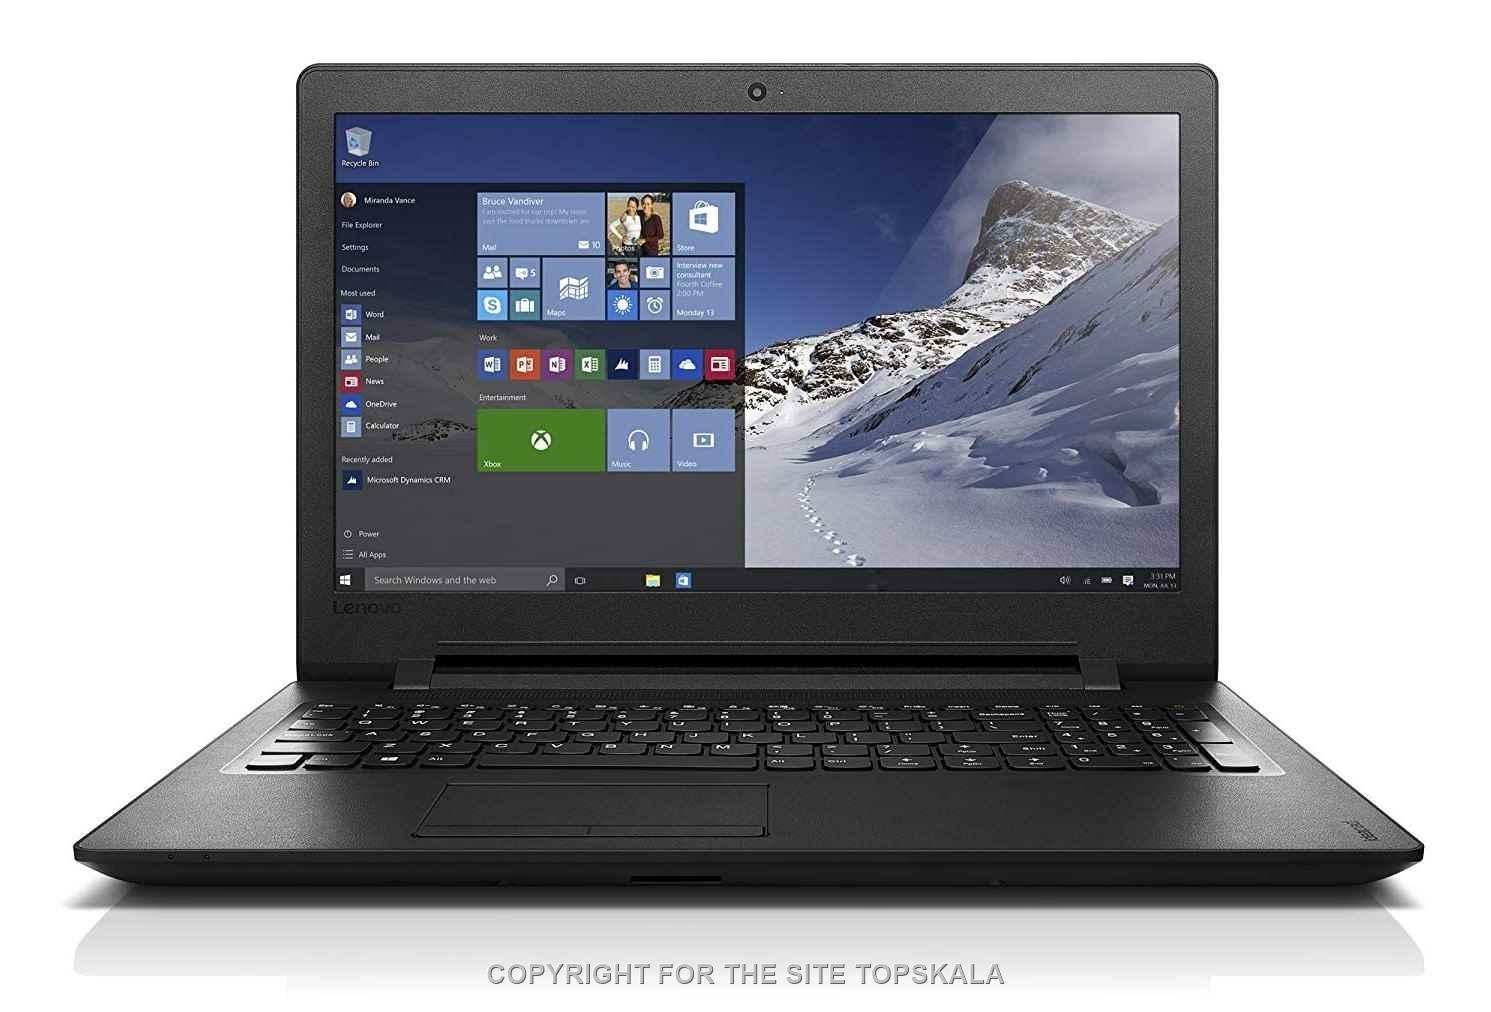 لنوو / لپ تاپ استوک لنوو مدل lenovo ideapad 110